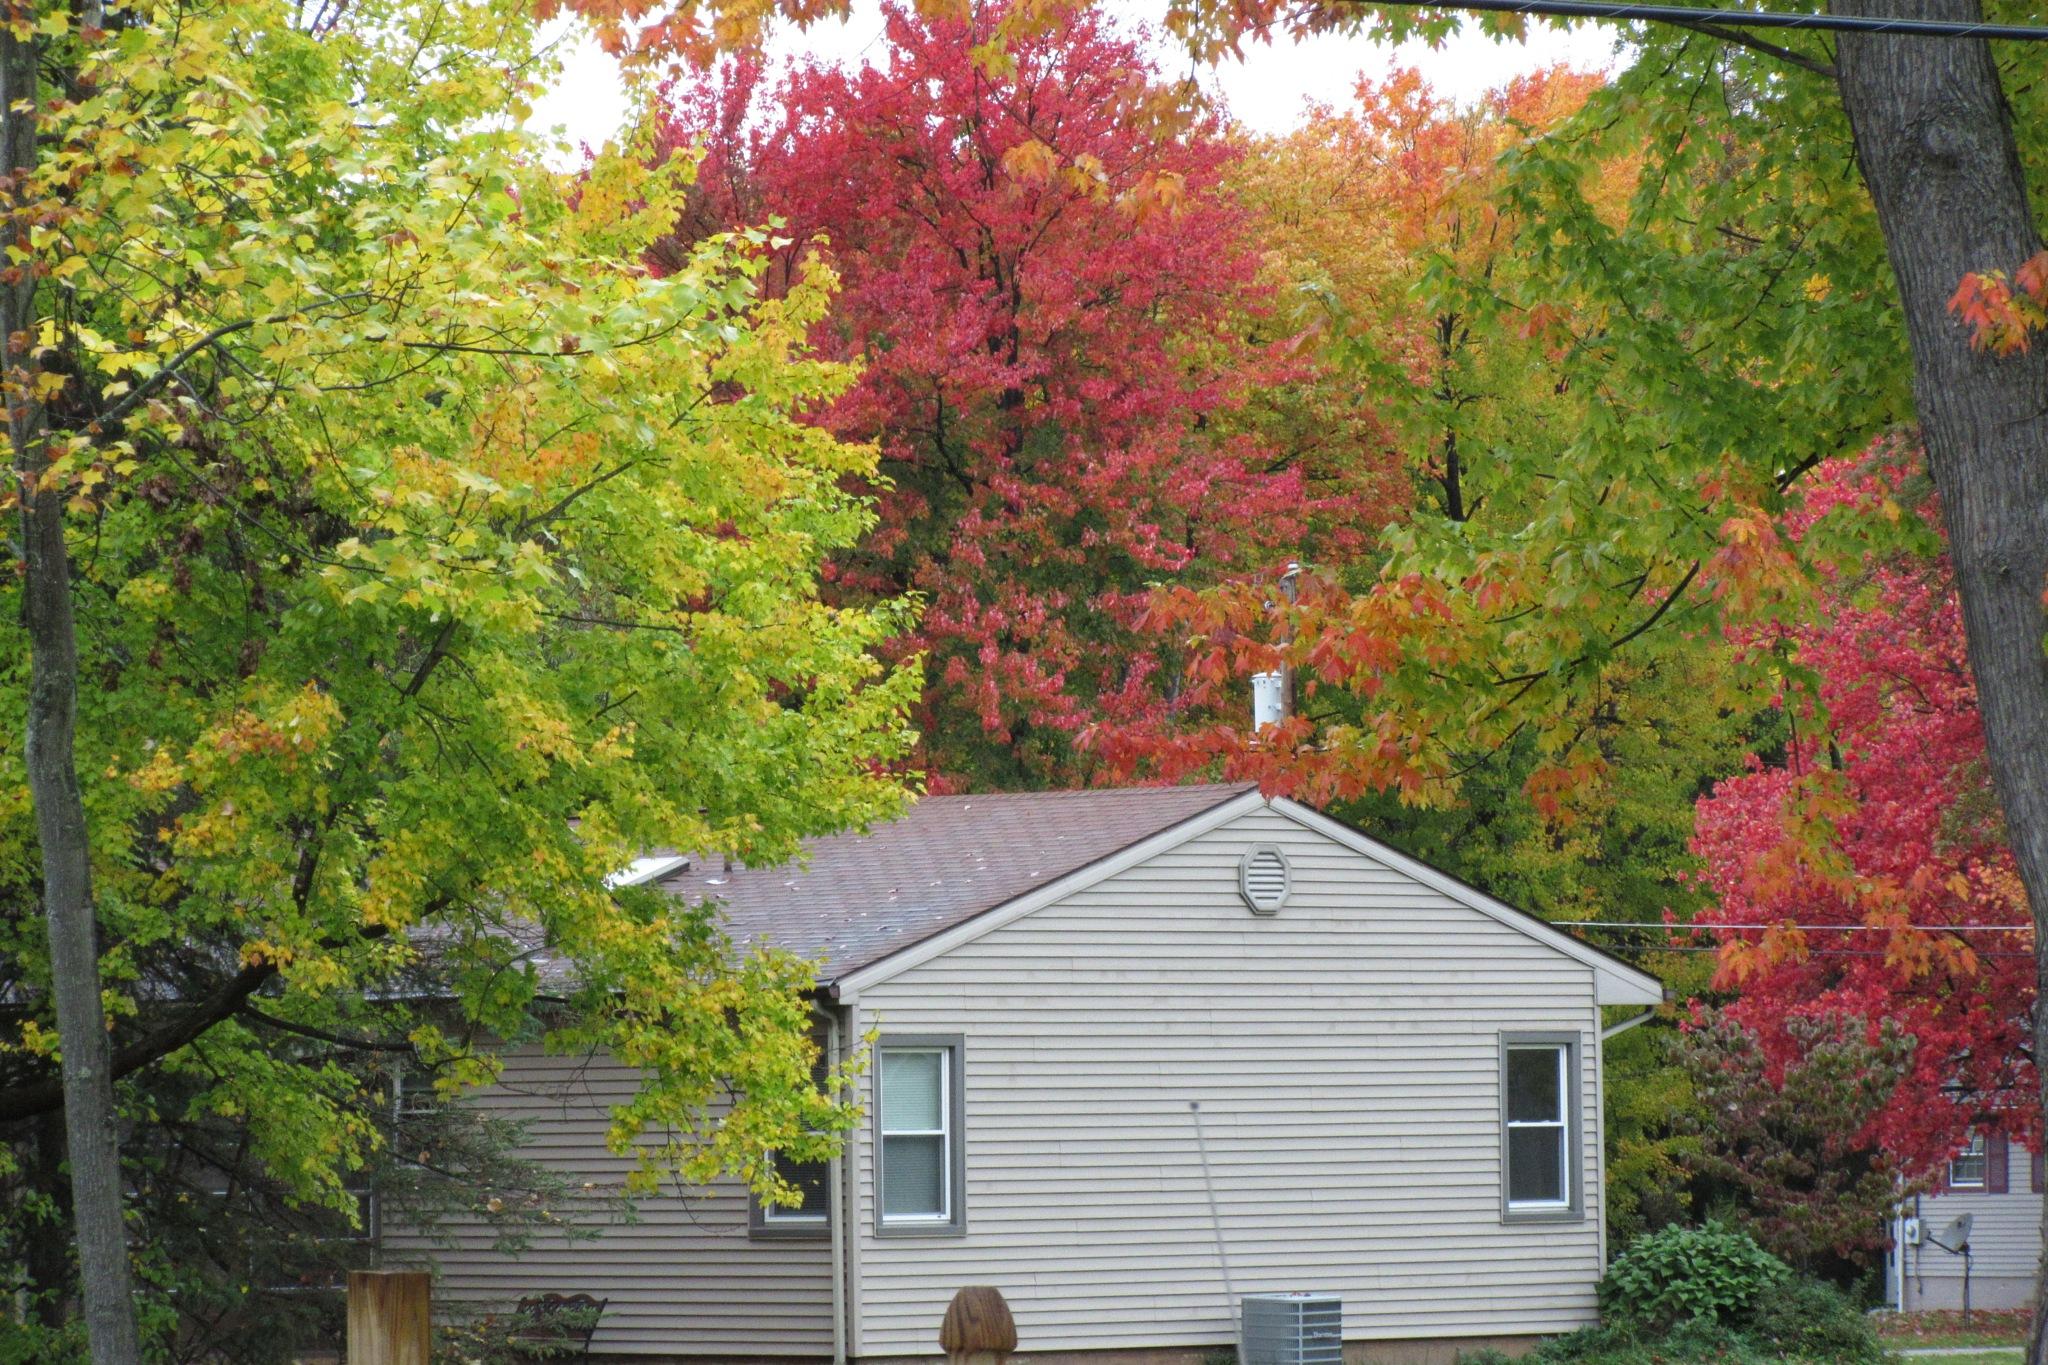 Not my House by Darlene Pavek